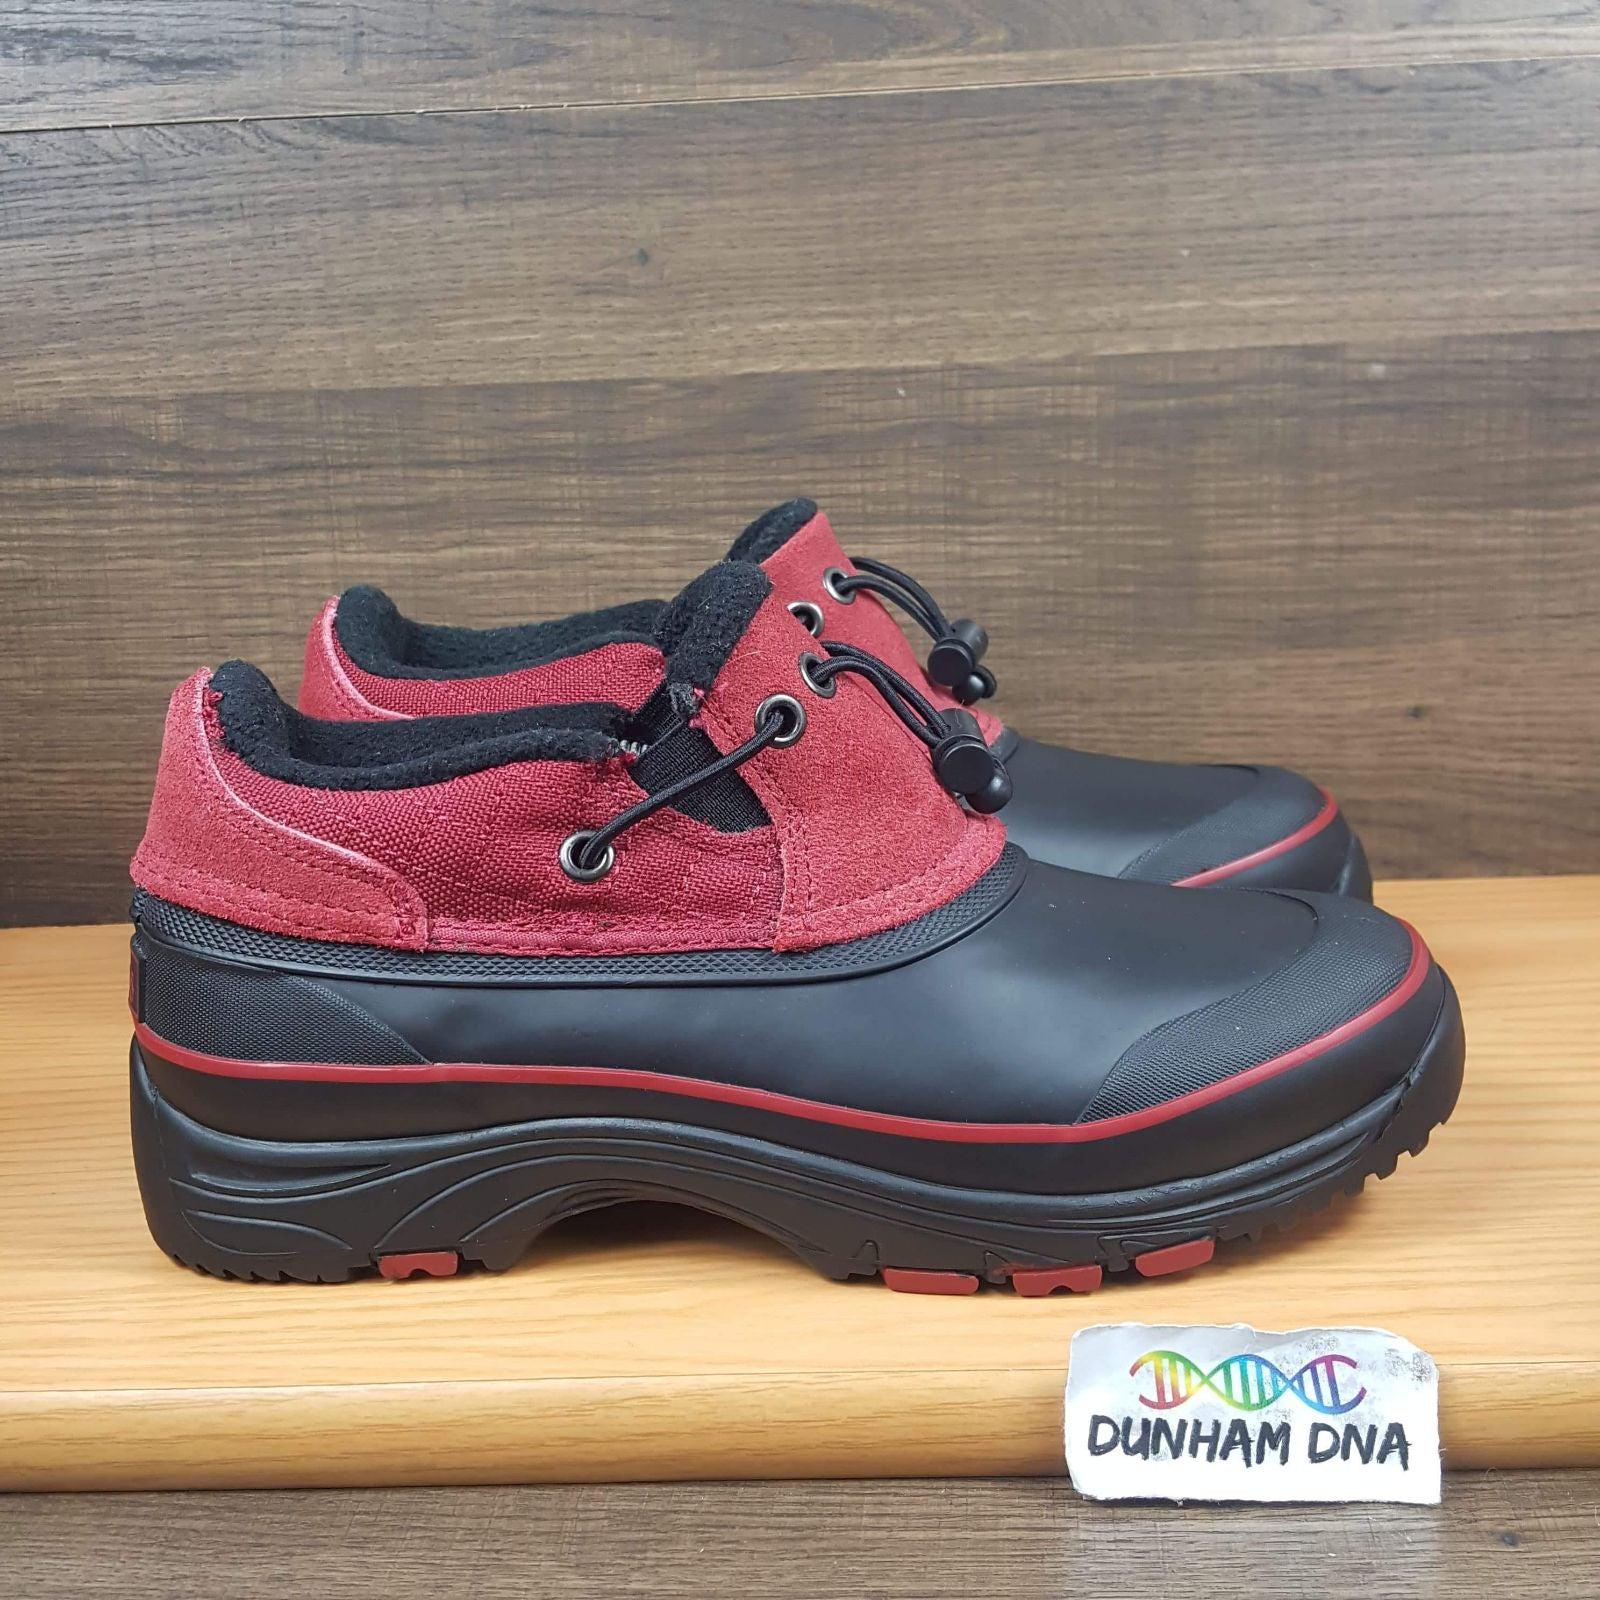 BASS Tabora Waterproof Boots Women's 7